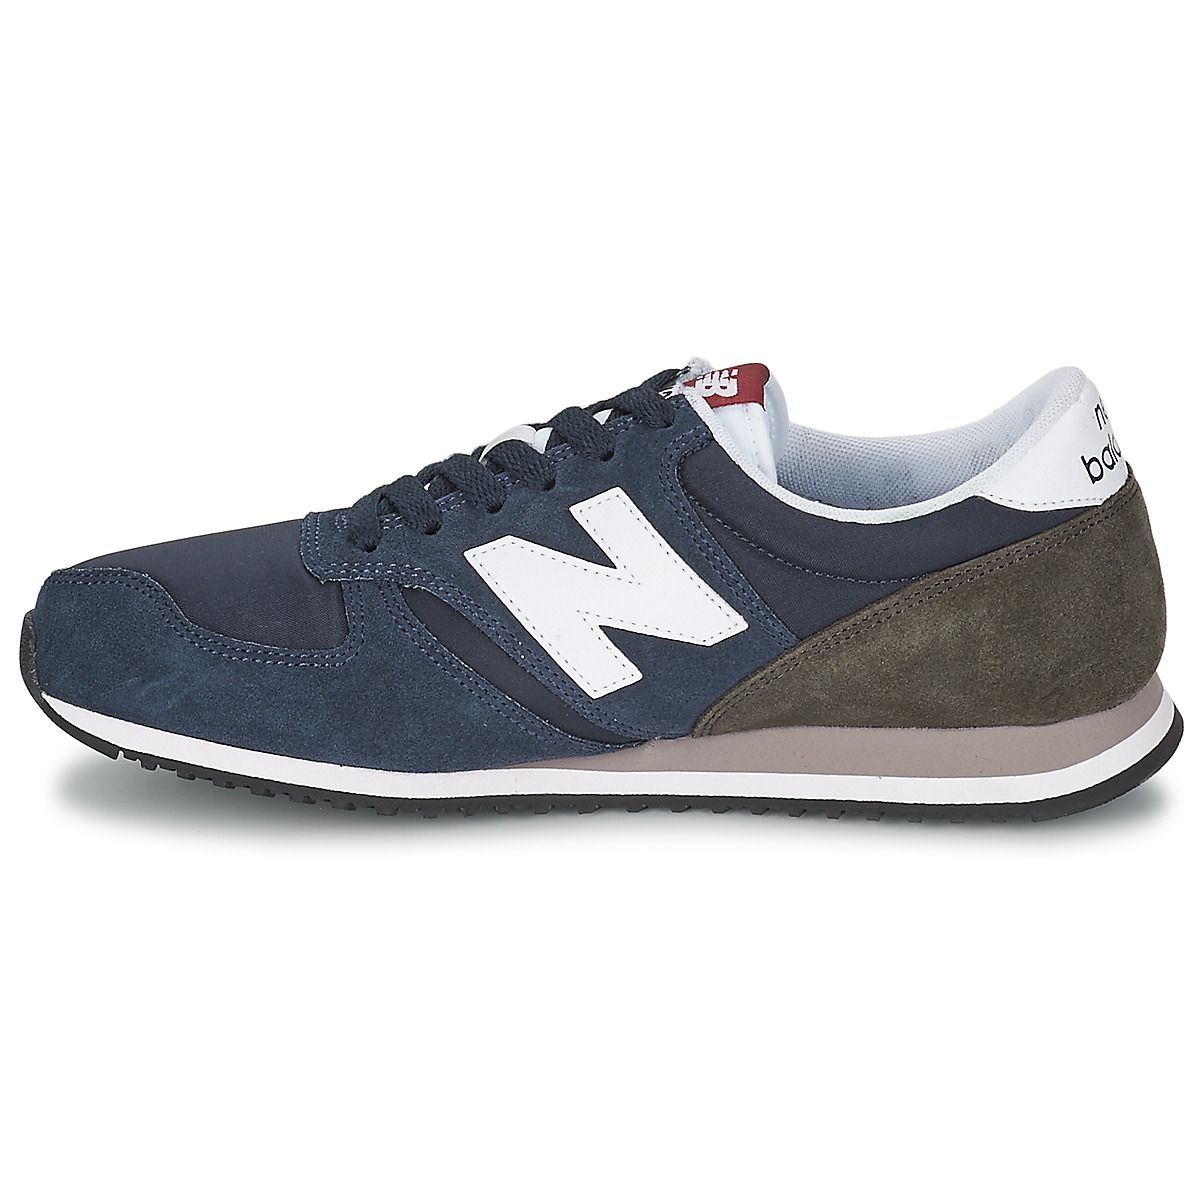 best service 1cb36 0e0d5 Baskets basses New Balance U420 Navy - Chaussure pas cher avec Shoes.fr ! -  Chaussures 84,99 €